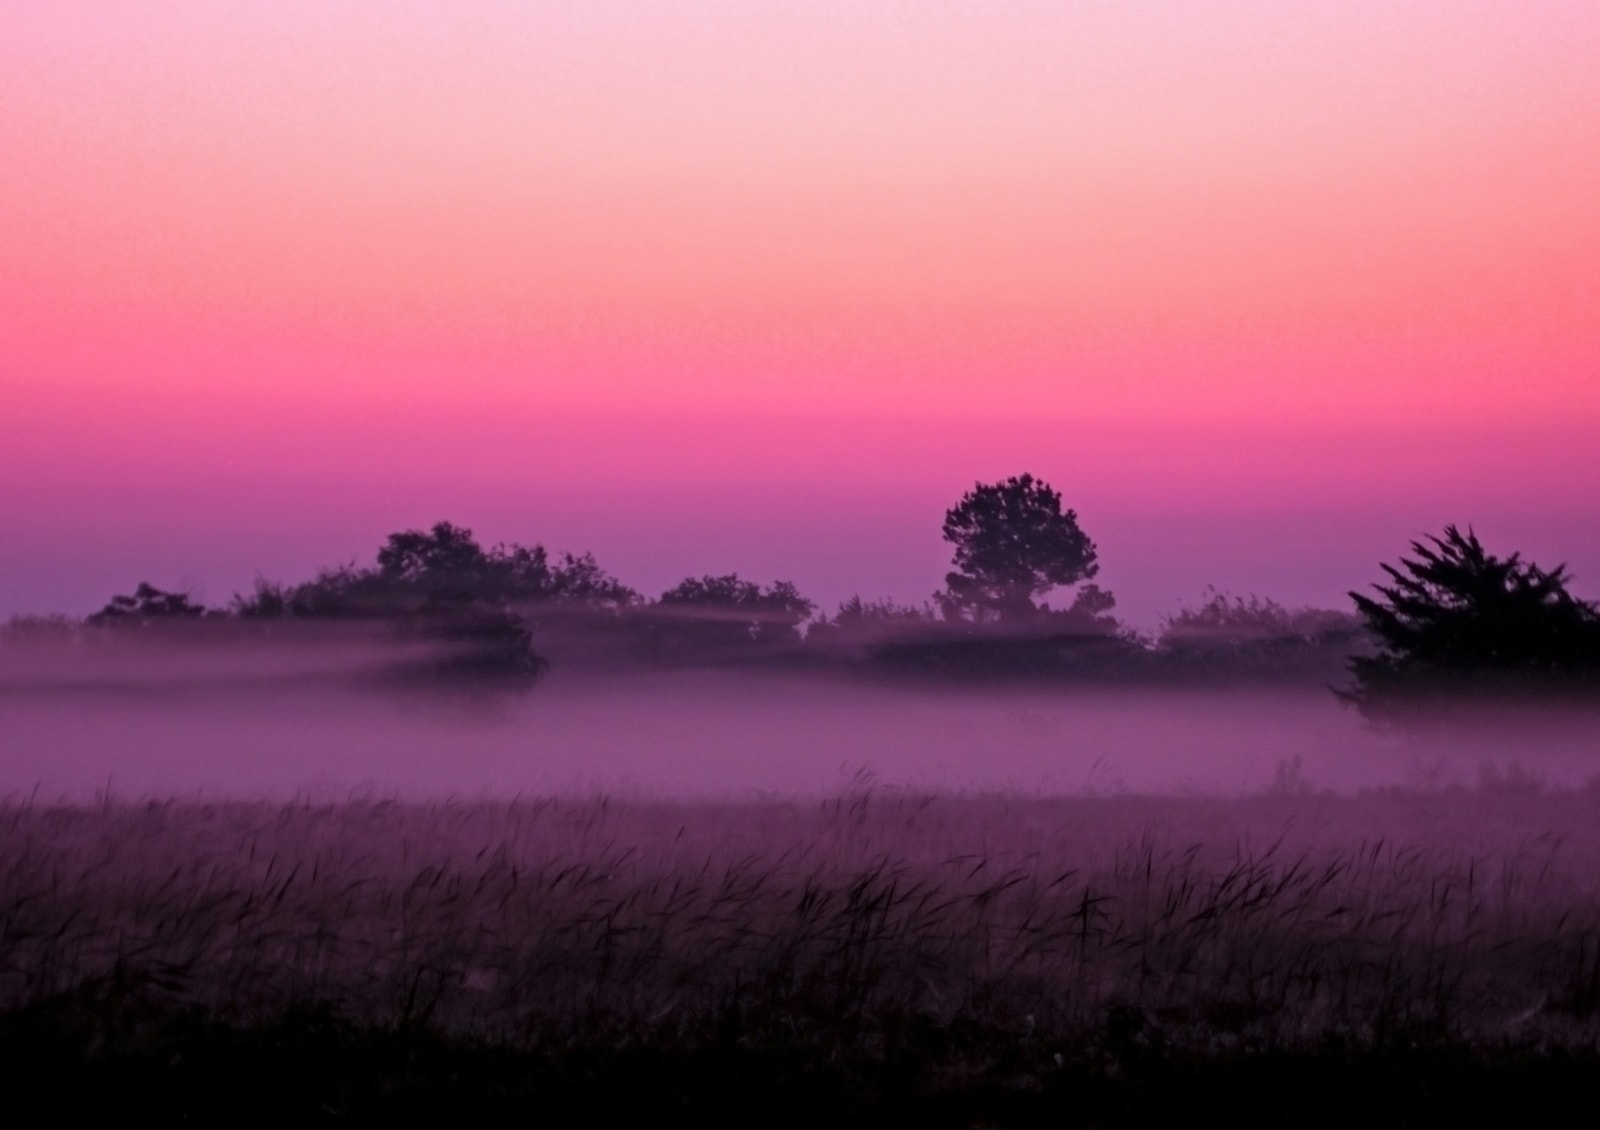 Morning foggy purple sunrise